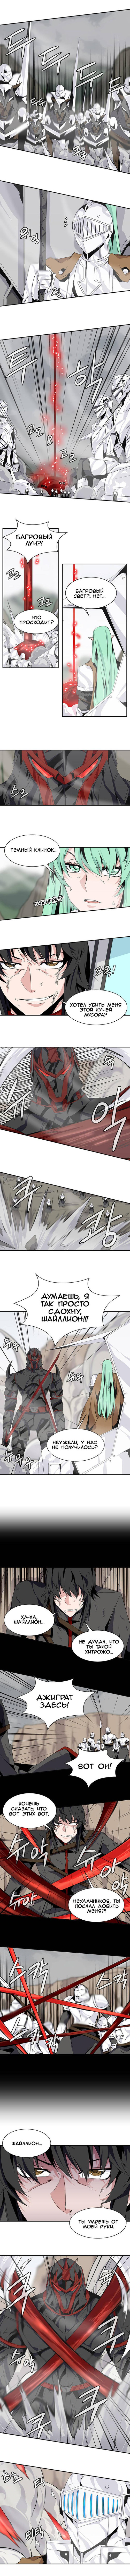 https://r1.ninemanga.com/comics/pic2/48/28784/325295/149560280043.jpg Page 2